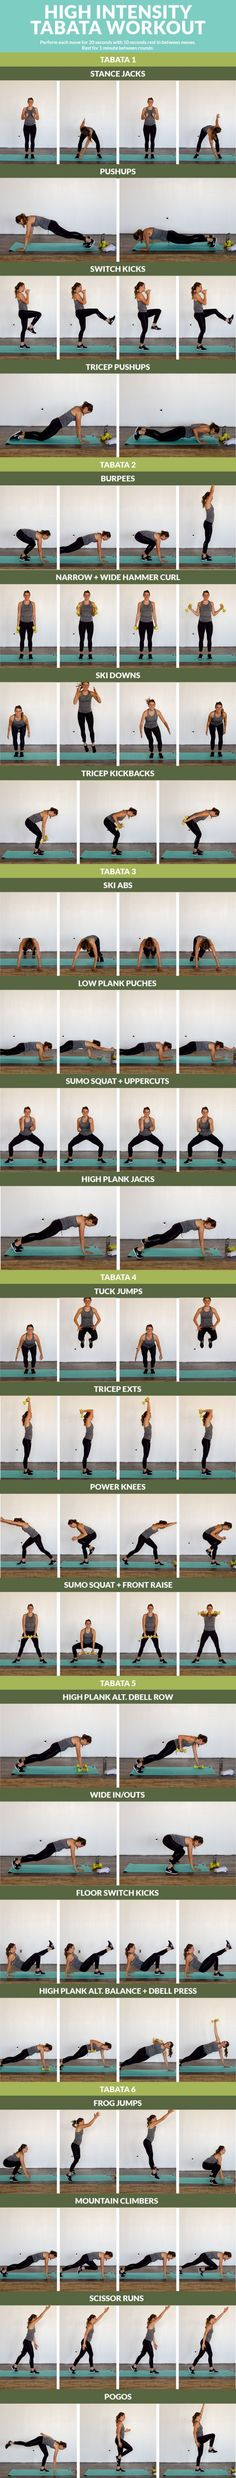 High-Impact-Tabata-Workout Easy Ab Workout, Tabata Workouts, Hiit,